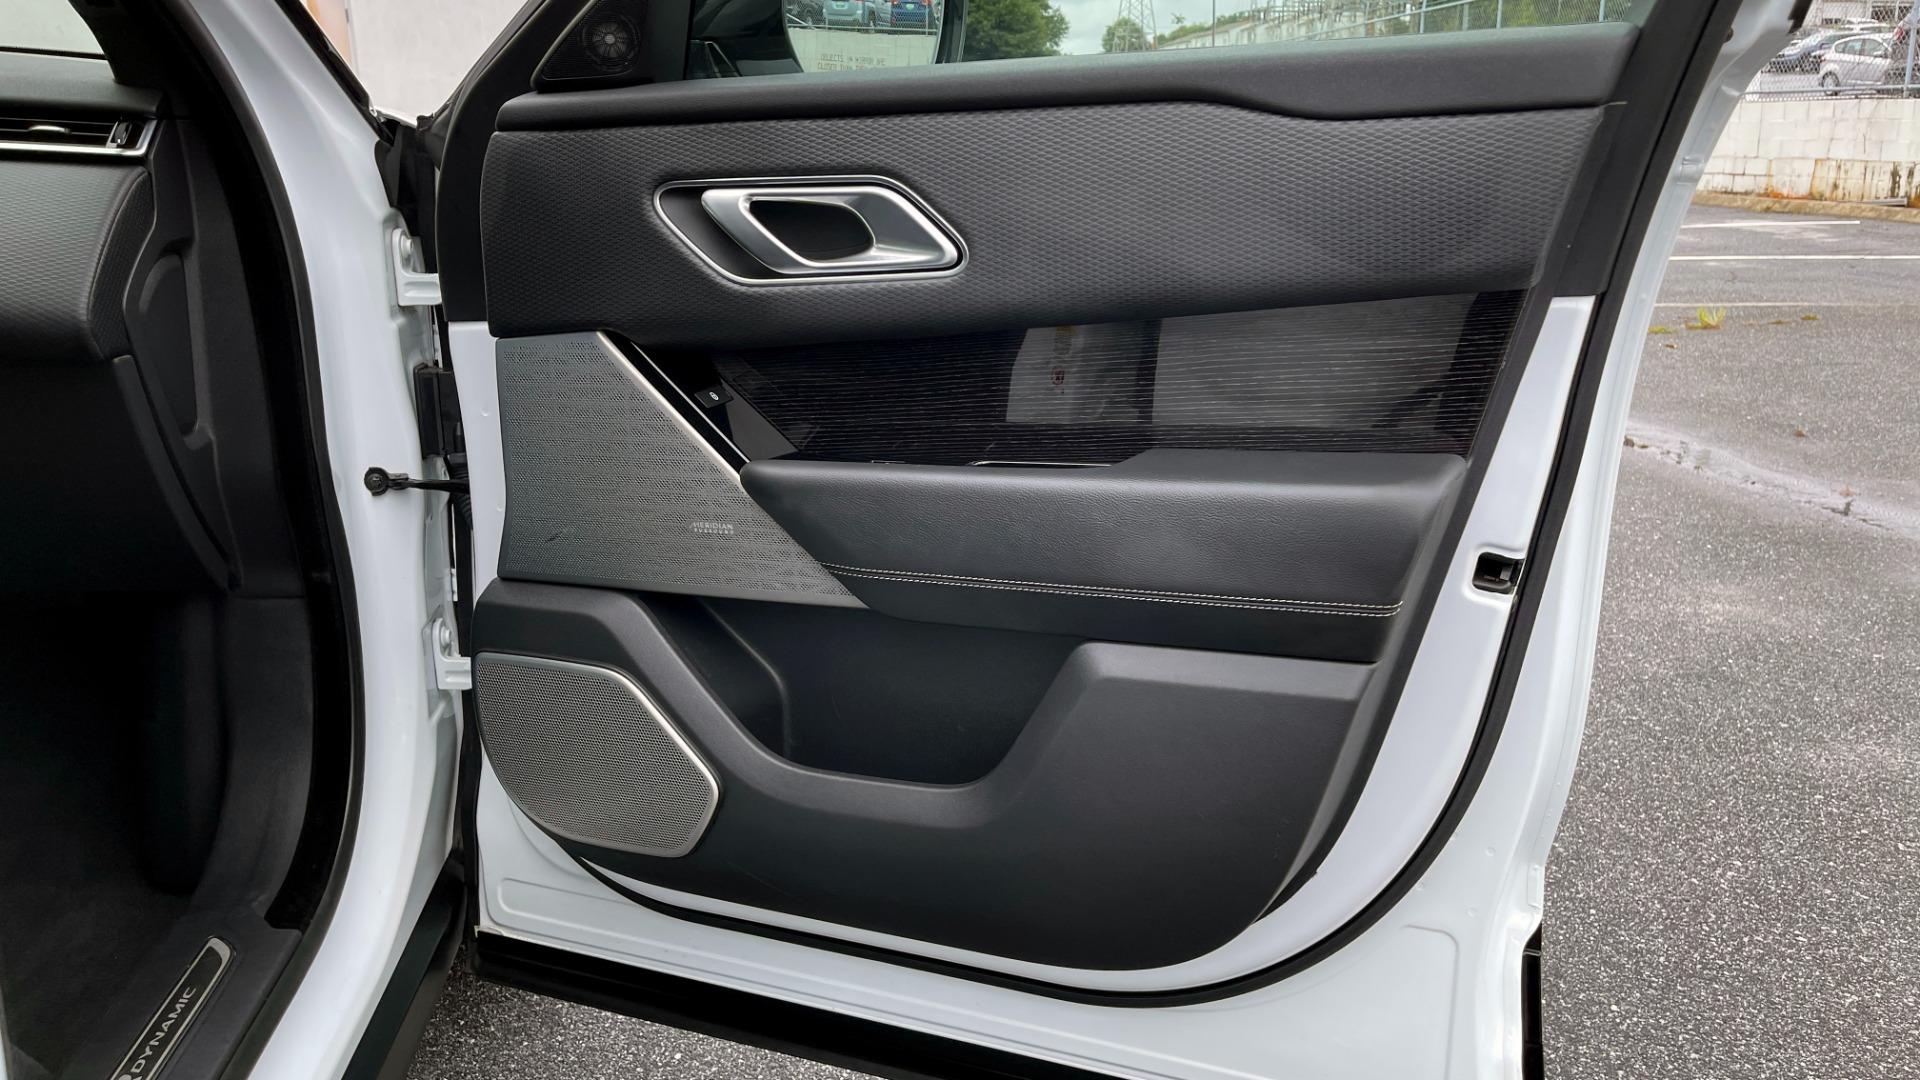 Used 2018 Land Rover RANGE ROVER VELAR R-DYNAMIC SE / NAV / PREM / MERIDIAN / SUNROOF / REARVIEW for sale $54,995 at Formula Imports in Charlotte NC 28227 61